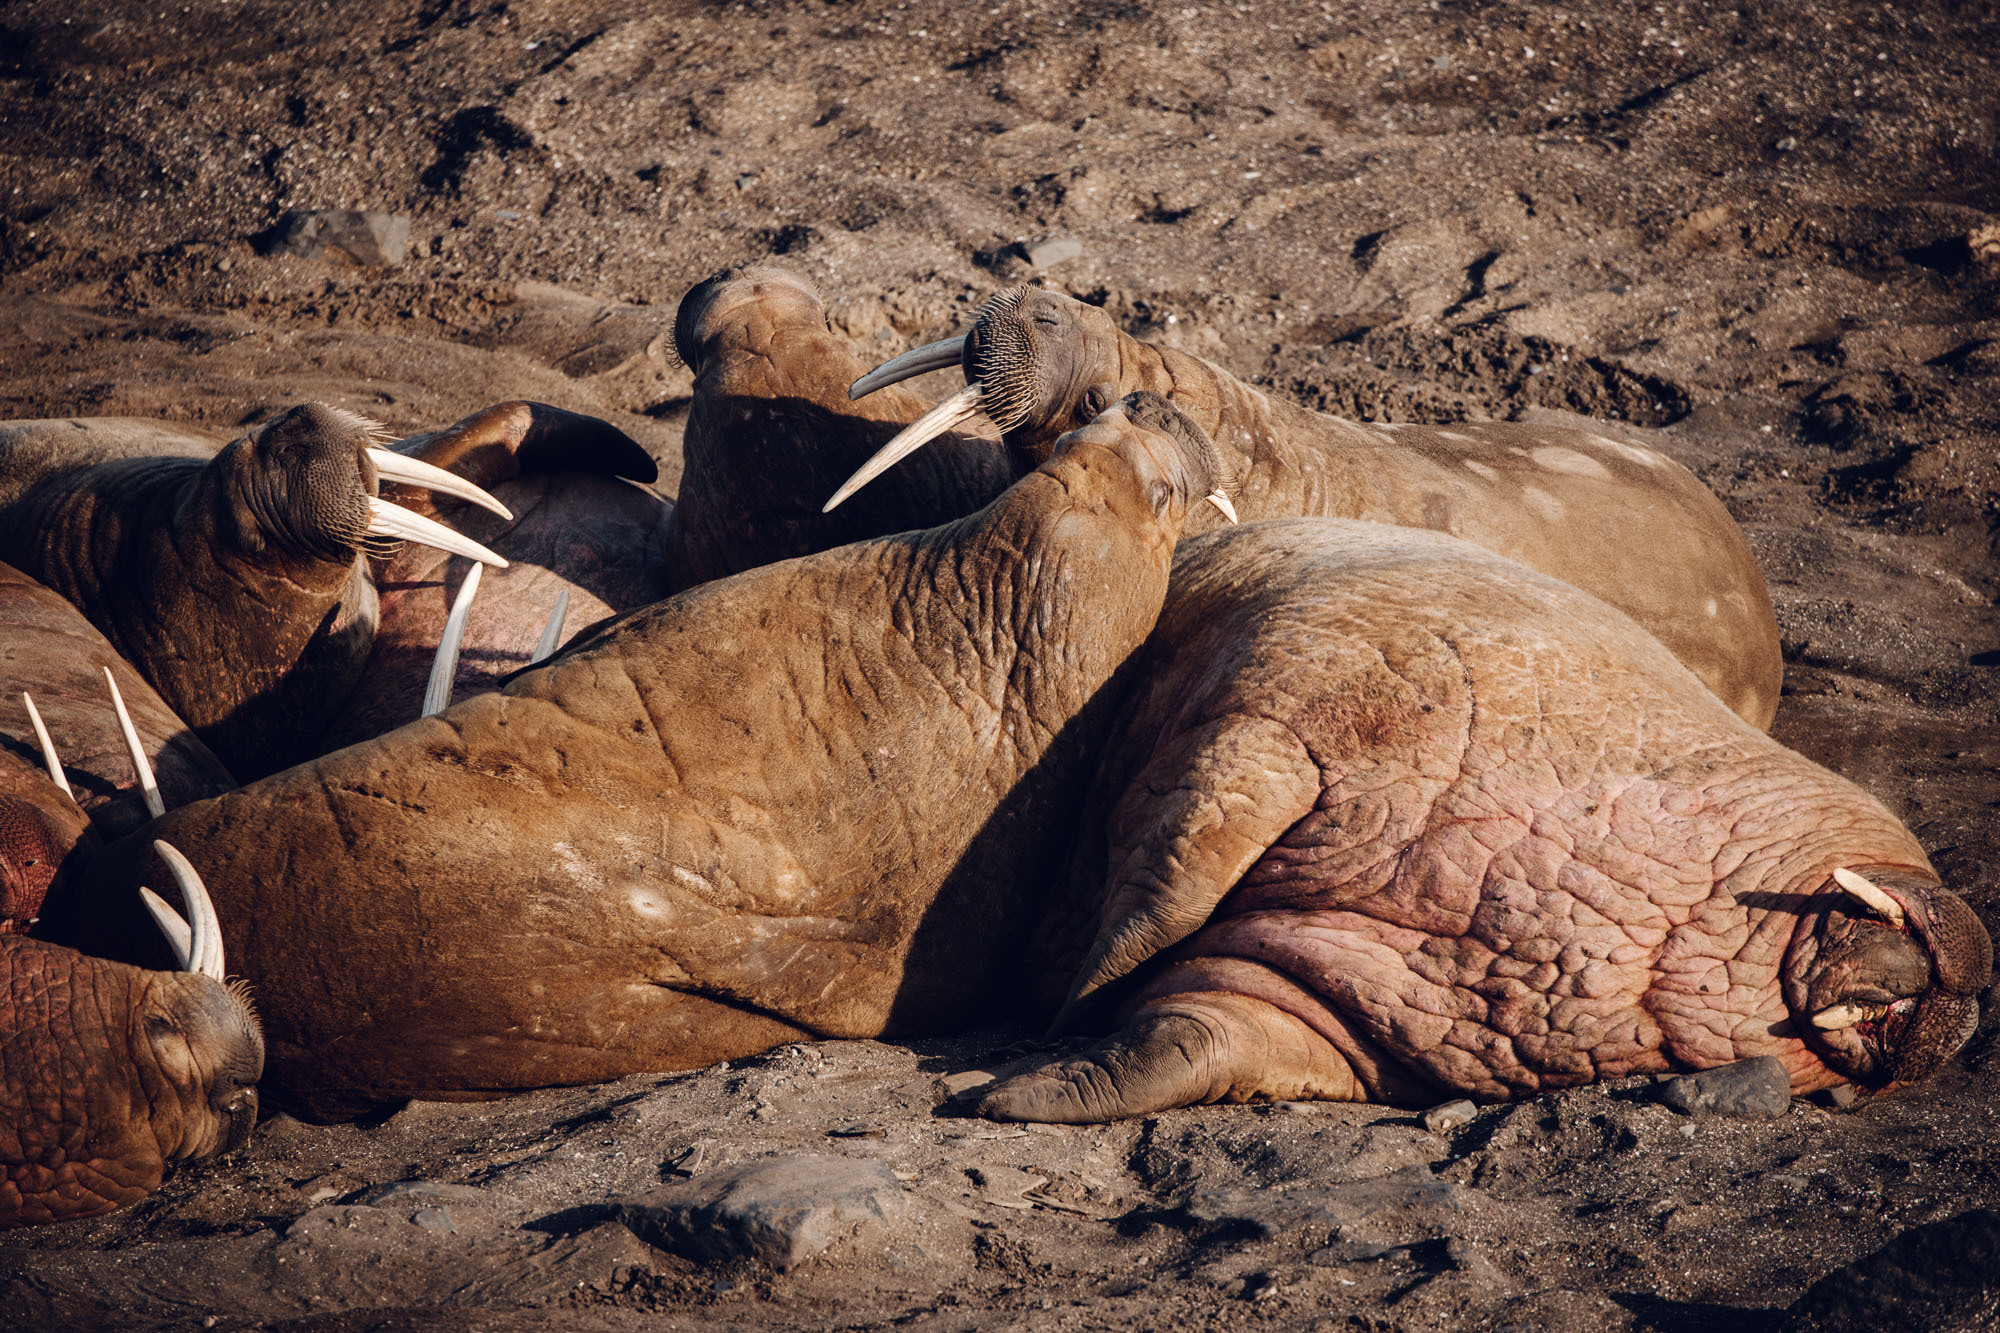 Walruses in Spitsbergen, Svalbard, Norway